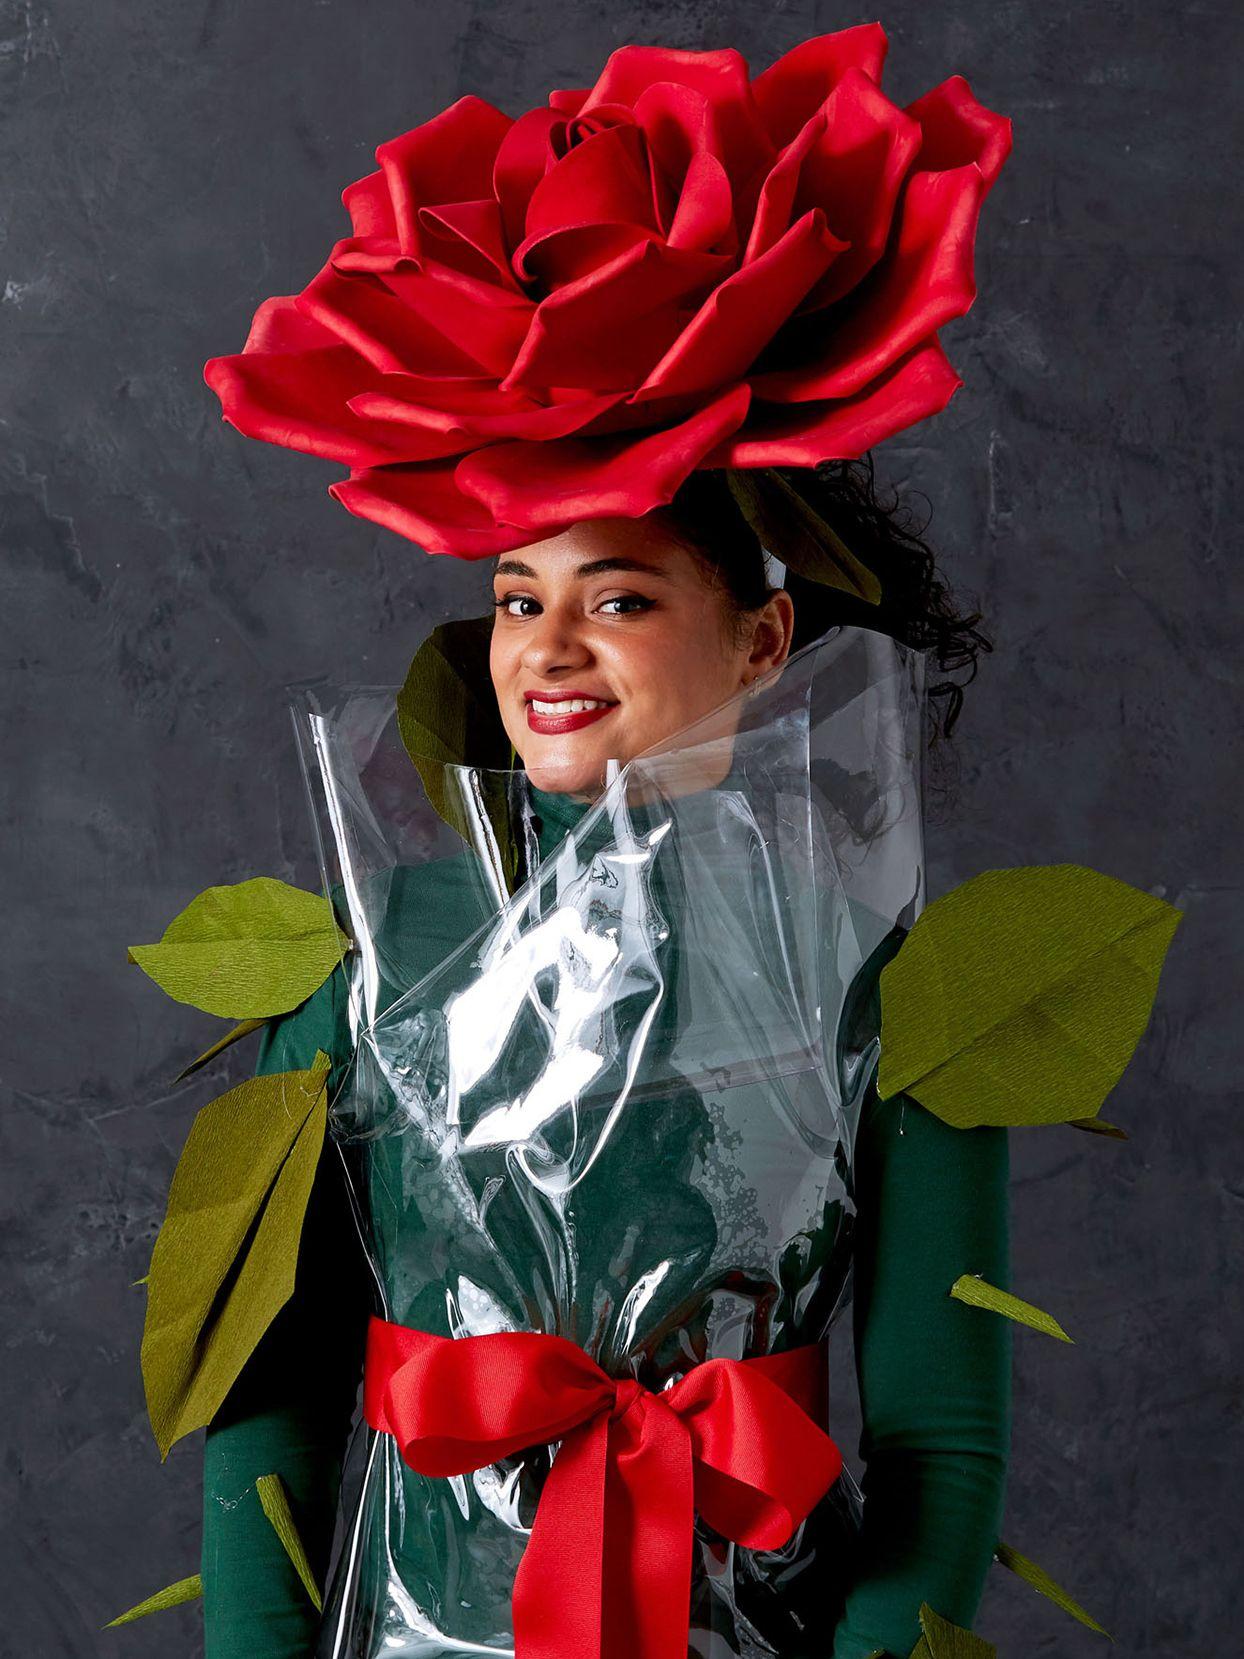 17 Last Minute Costume Ideas For Halloween